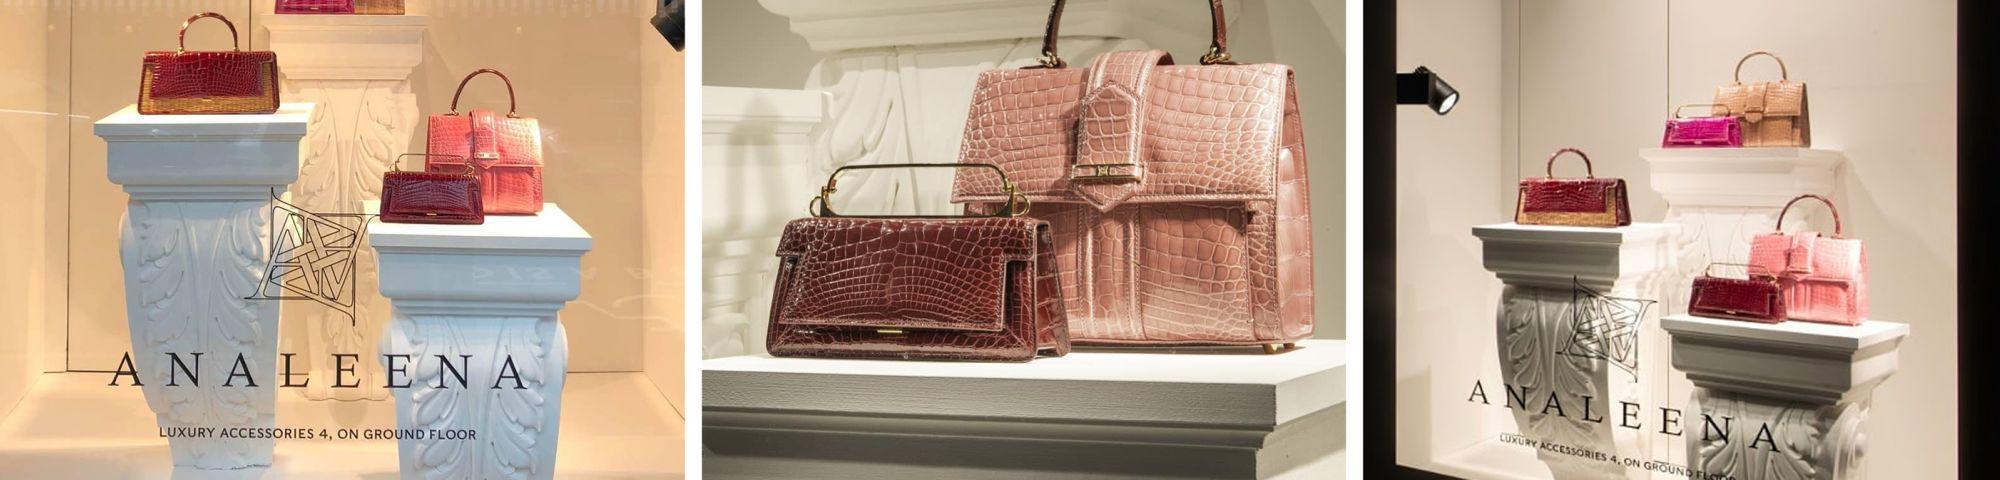 Harrods Shop Window with Analeena handbags on display